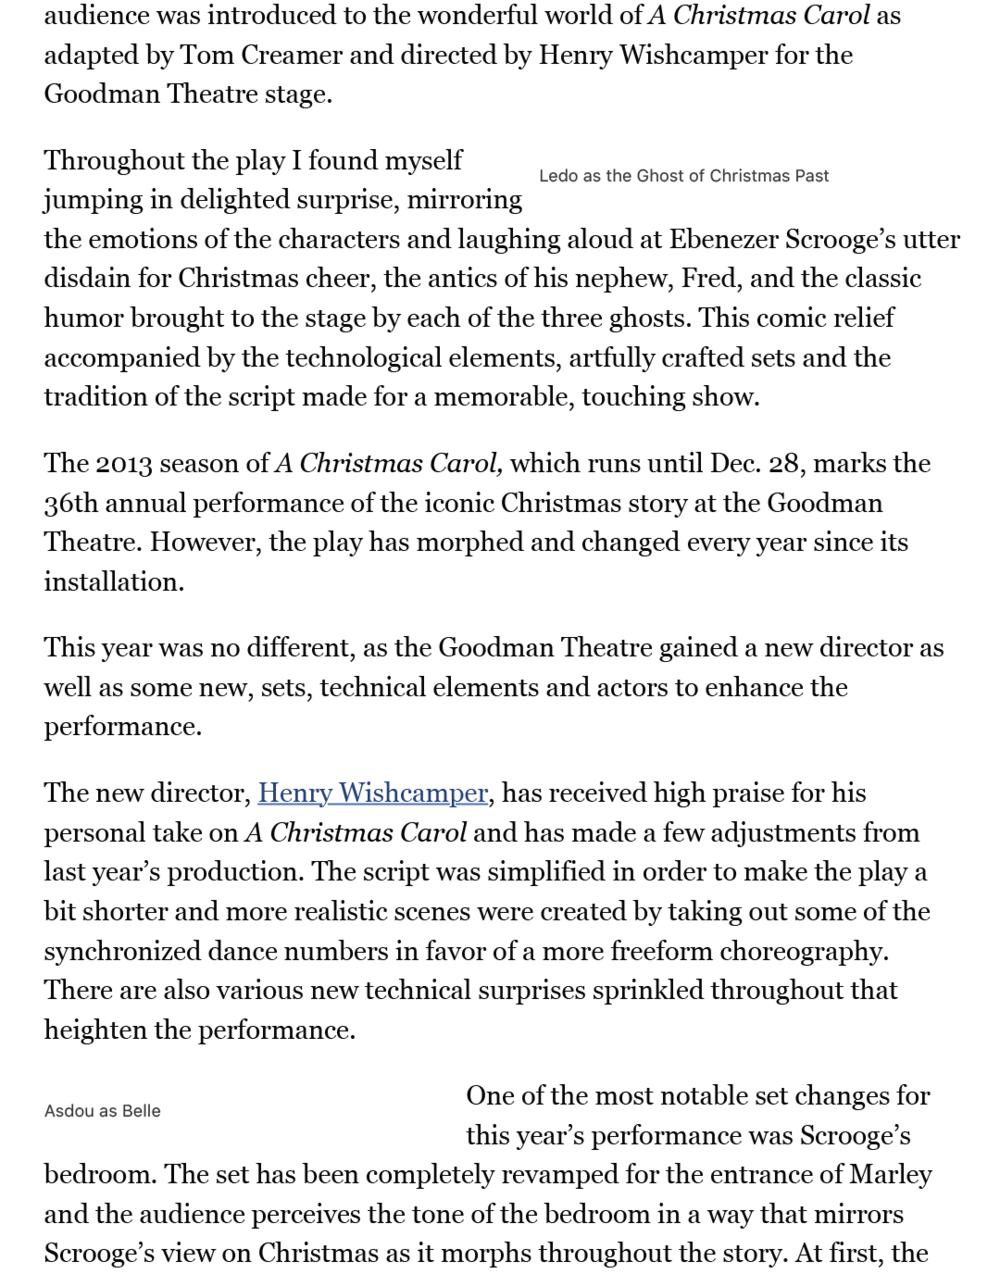 loyola phoenix a christmas carol at the goodman theater